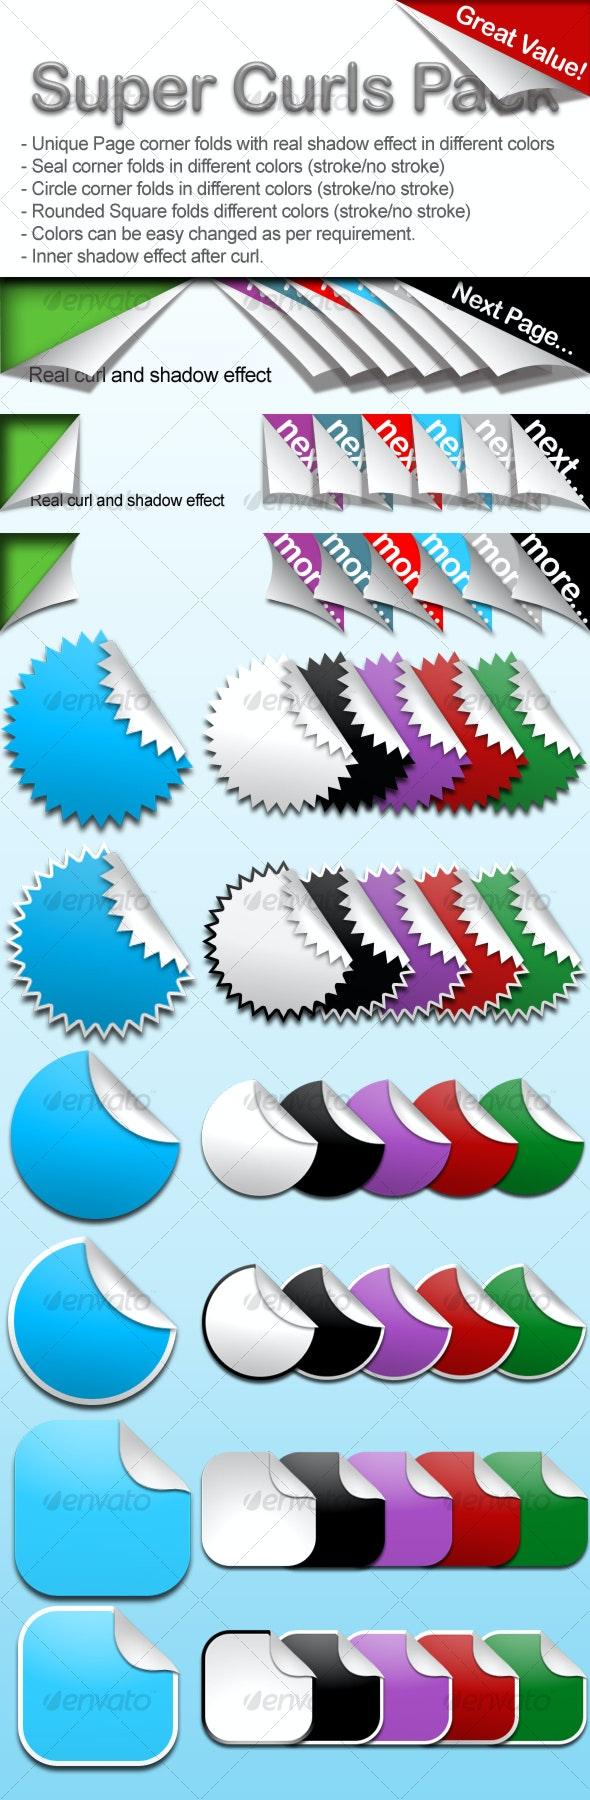 Super Curls & Page Foldes Pack - Web Elements